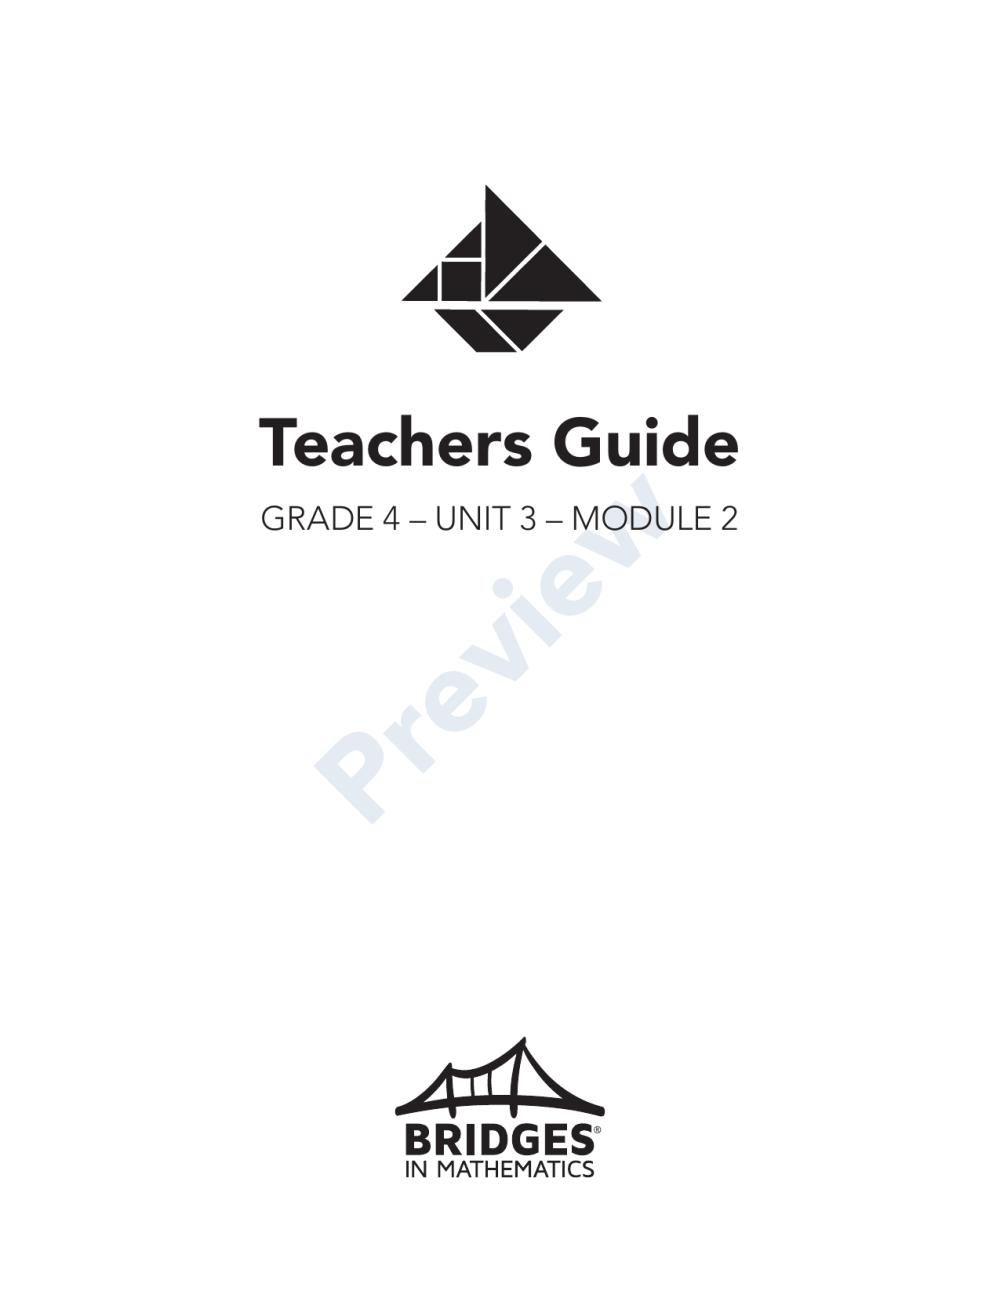 medium resolution of Bridges in Mathematics Grade 4 Teachers Guide   Manualzz